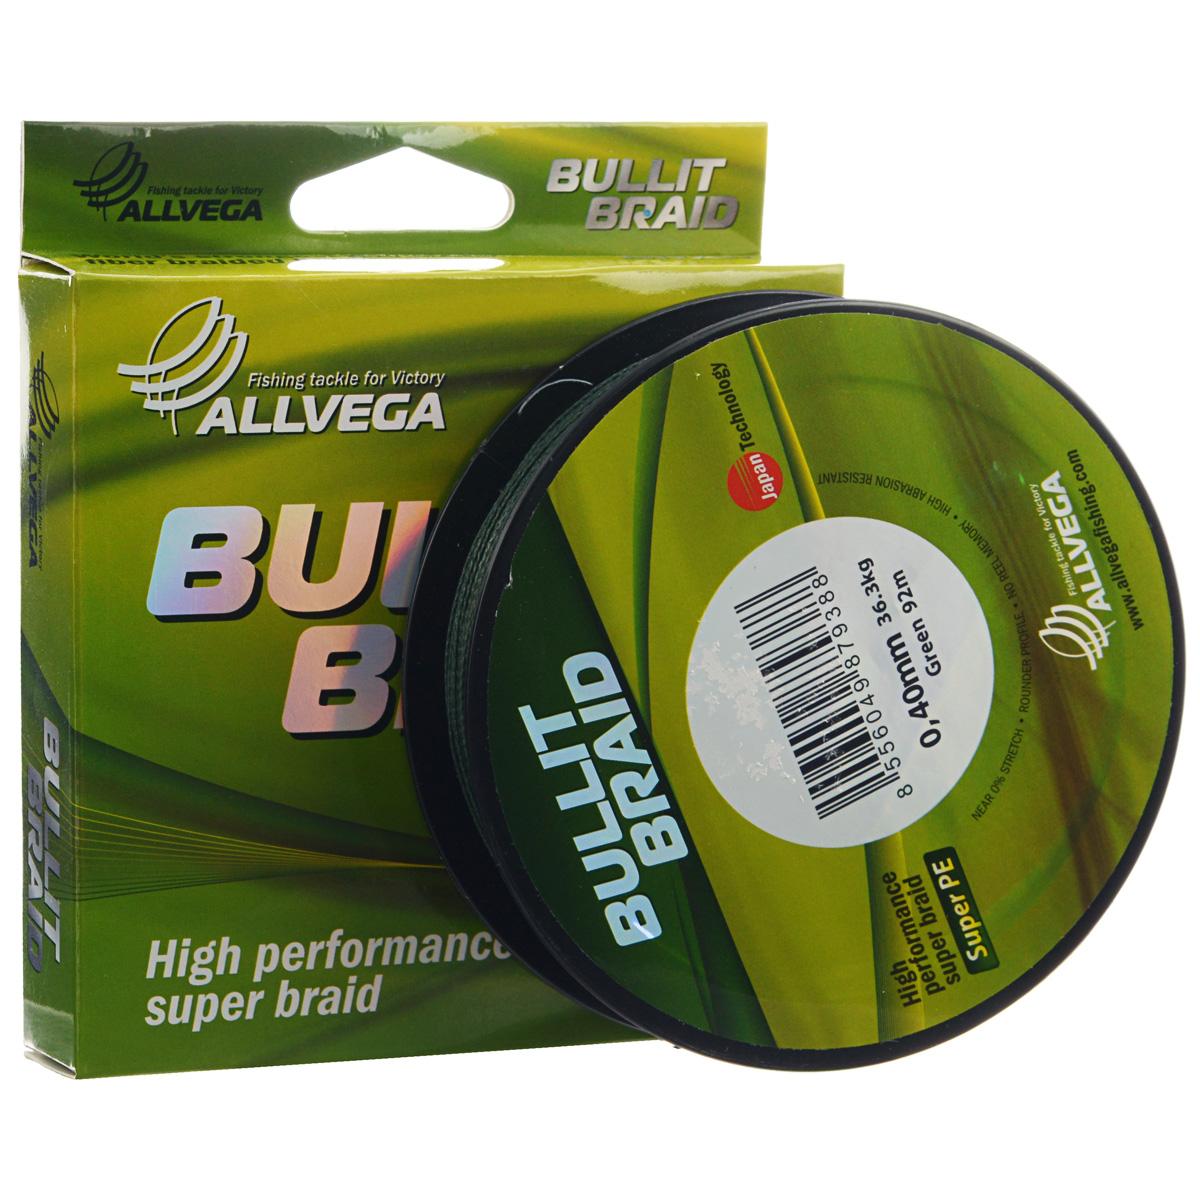 Леска плетеная Allvega Bullit Braid, цвет: темно-зеленый, 92 м, 0,4 мм, 36,3 кг